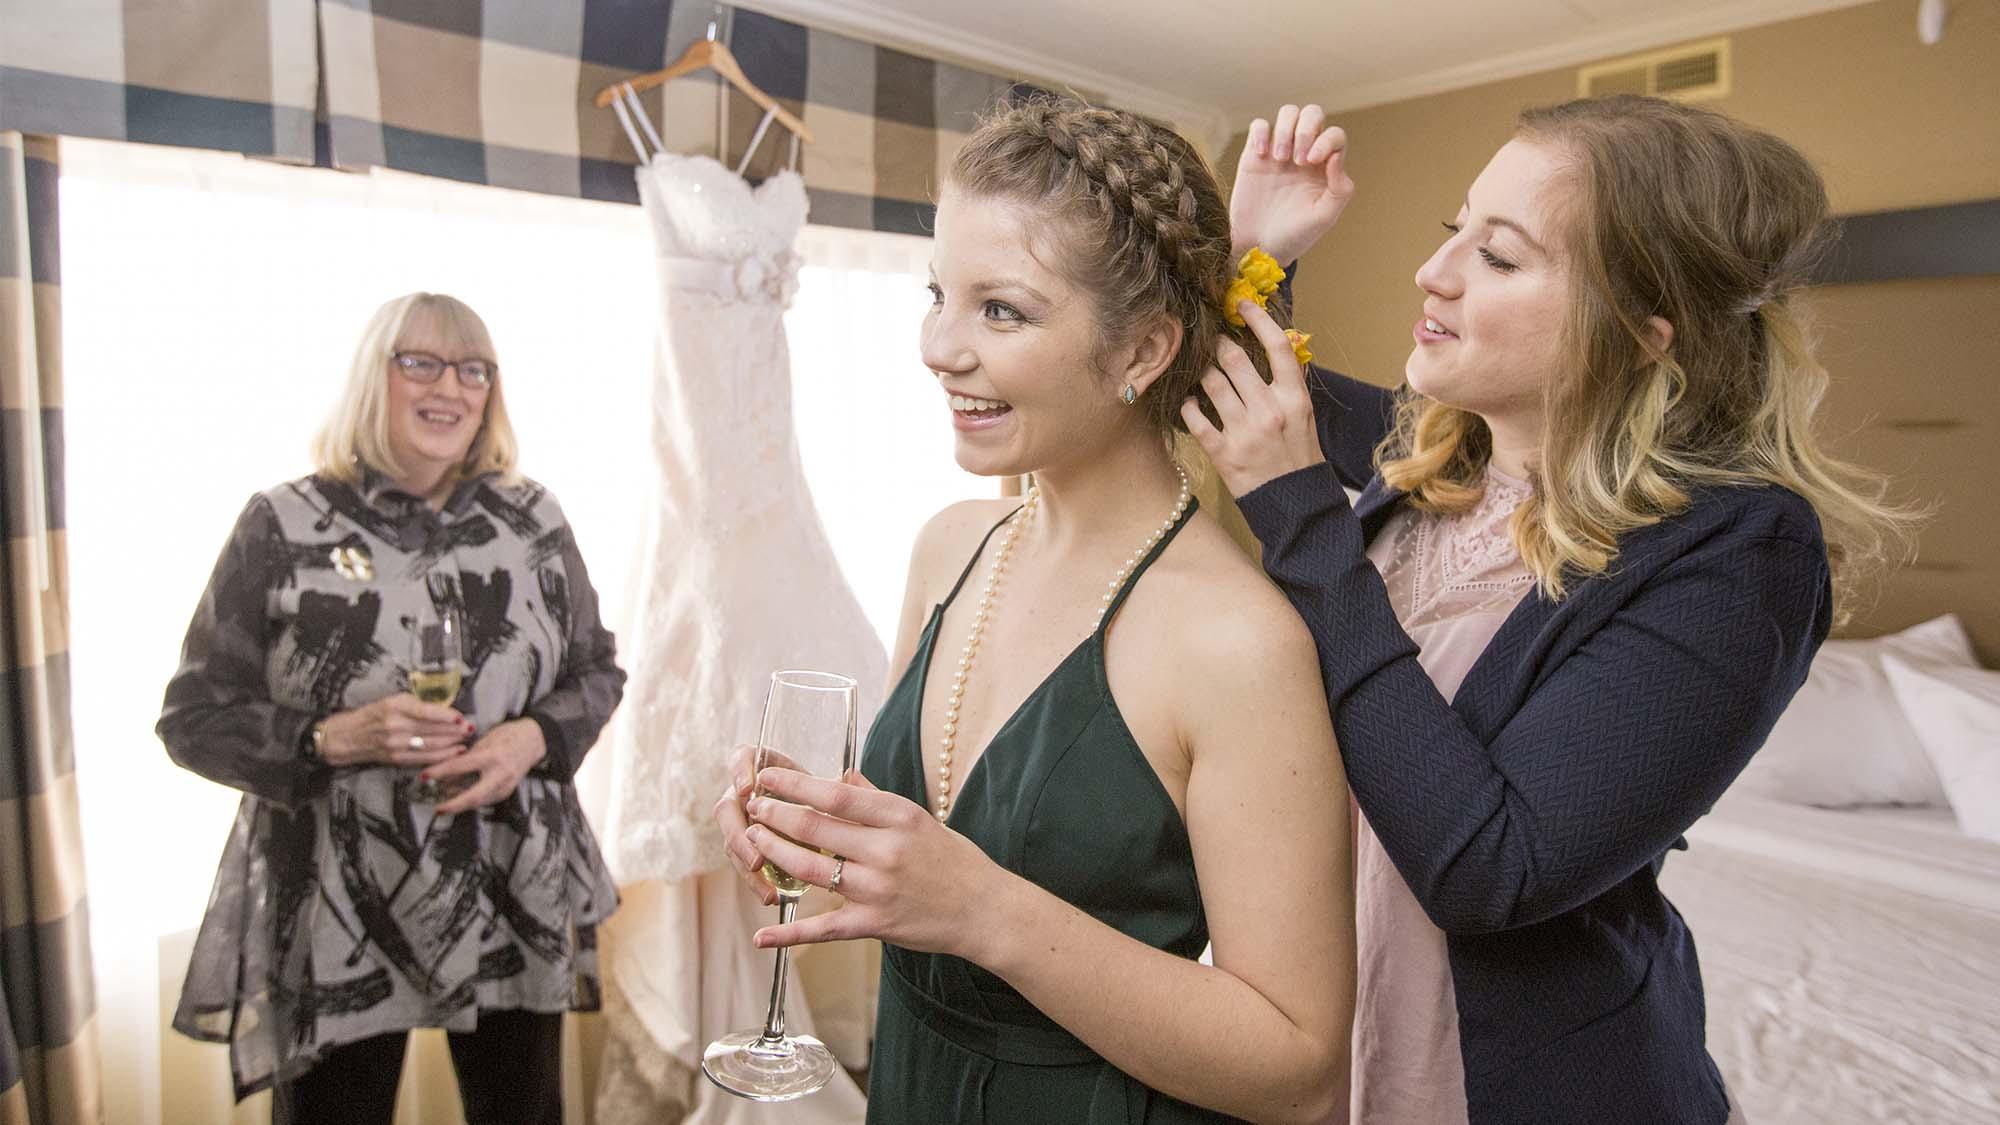 Southwest Michigan - Weddings